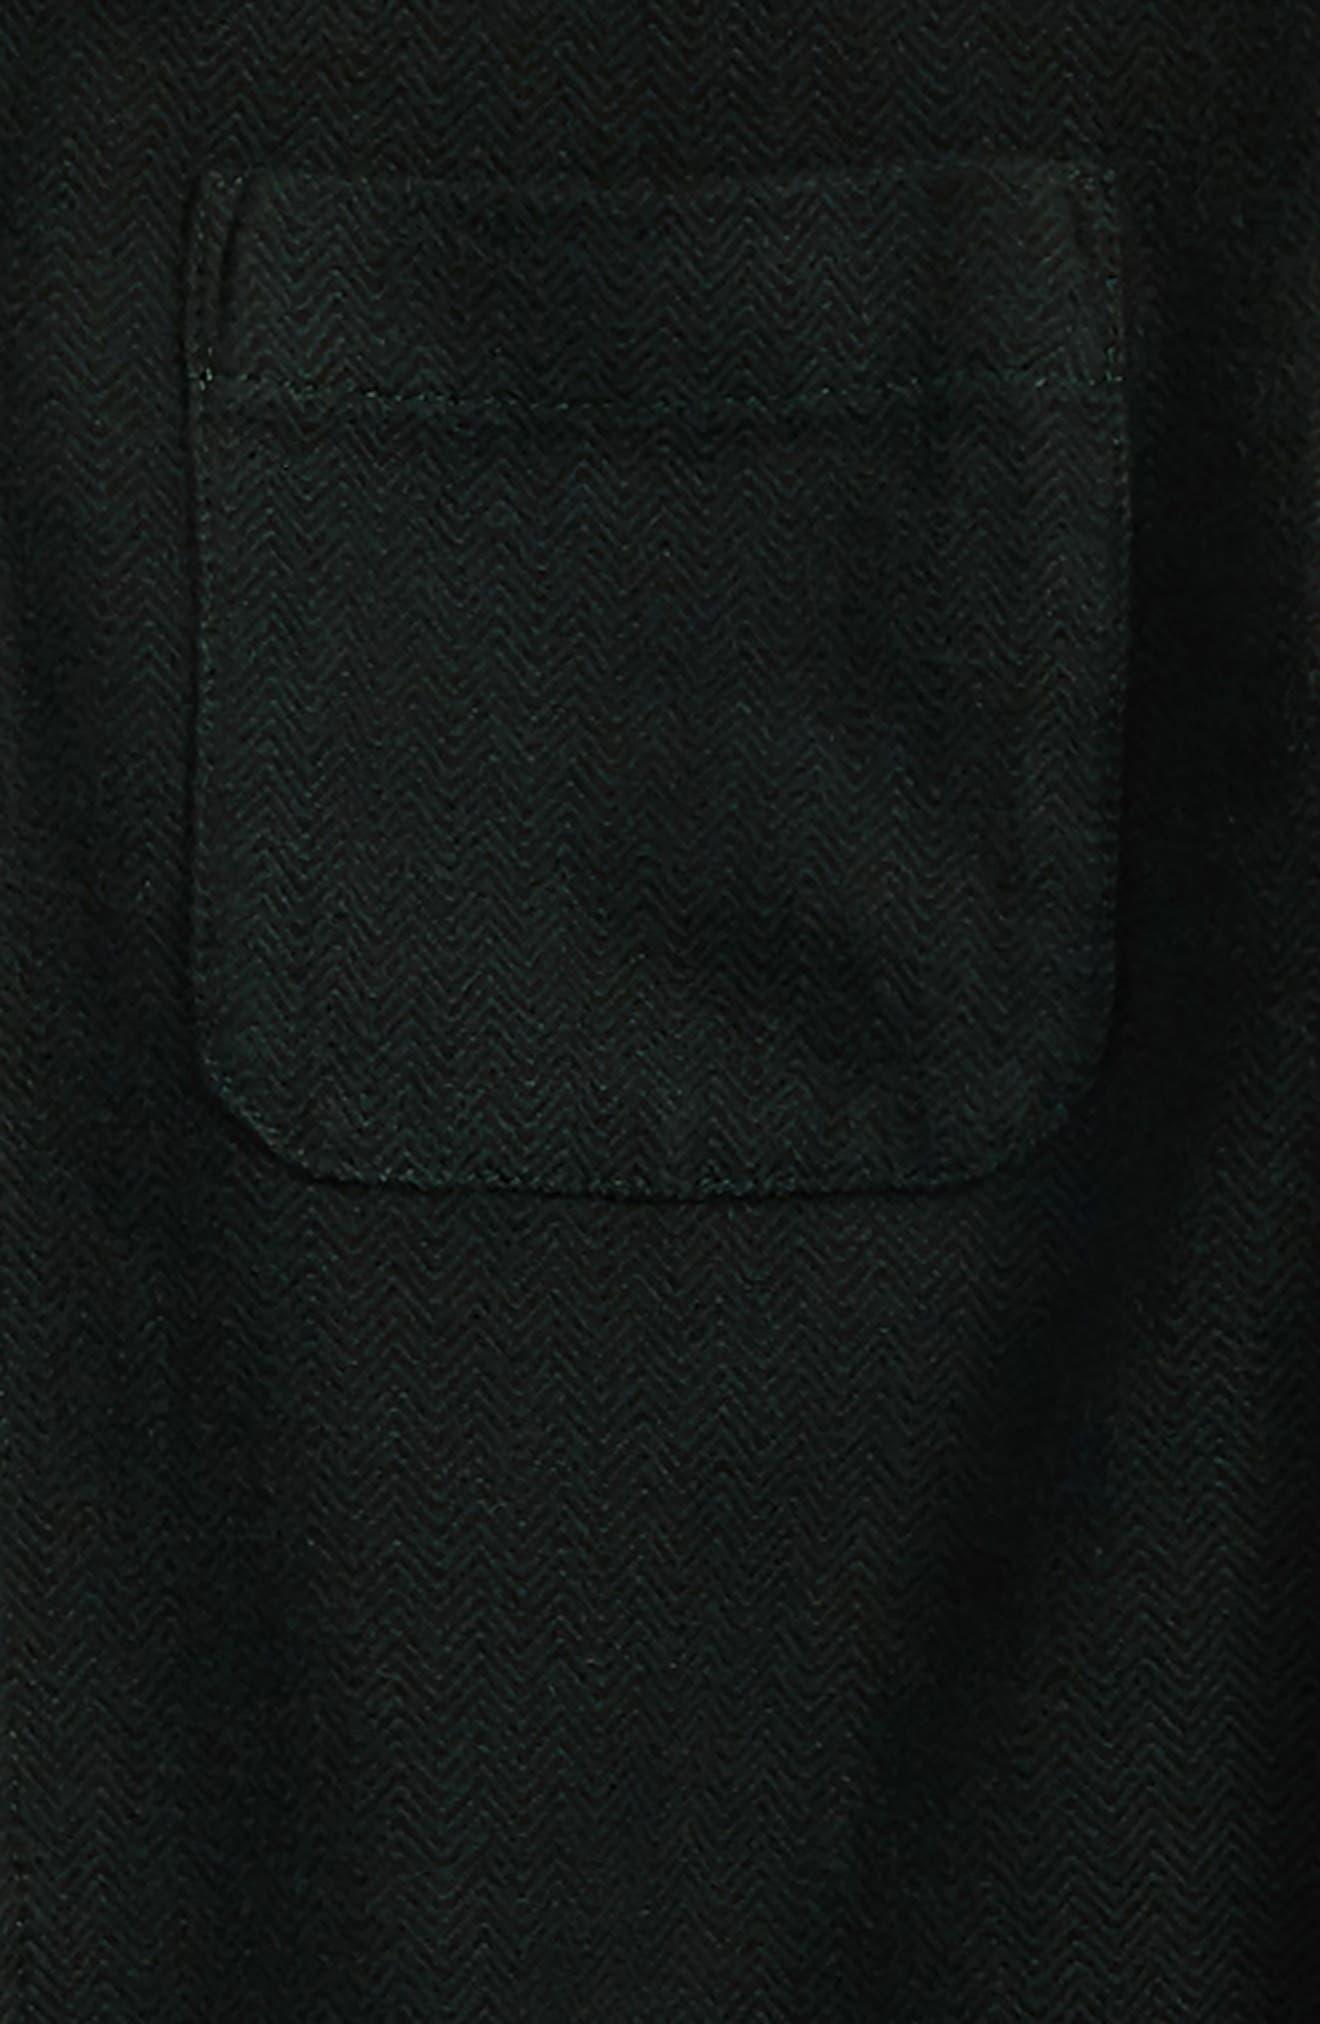 Herringbone Hooded Shirt,                             Alternate thumbnail 2, color,                             Green Pinecone Herringbone